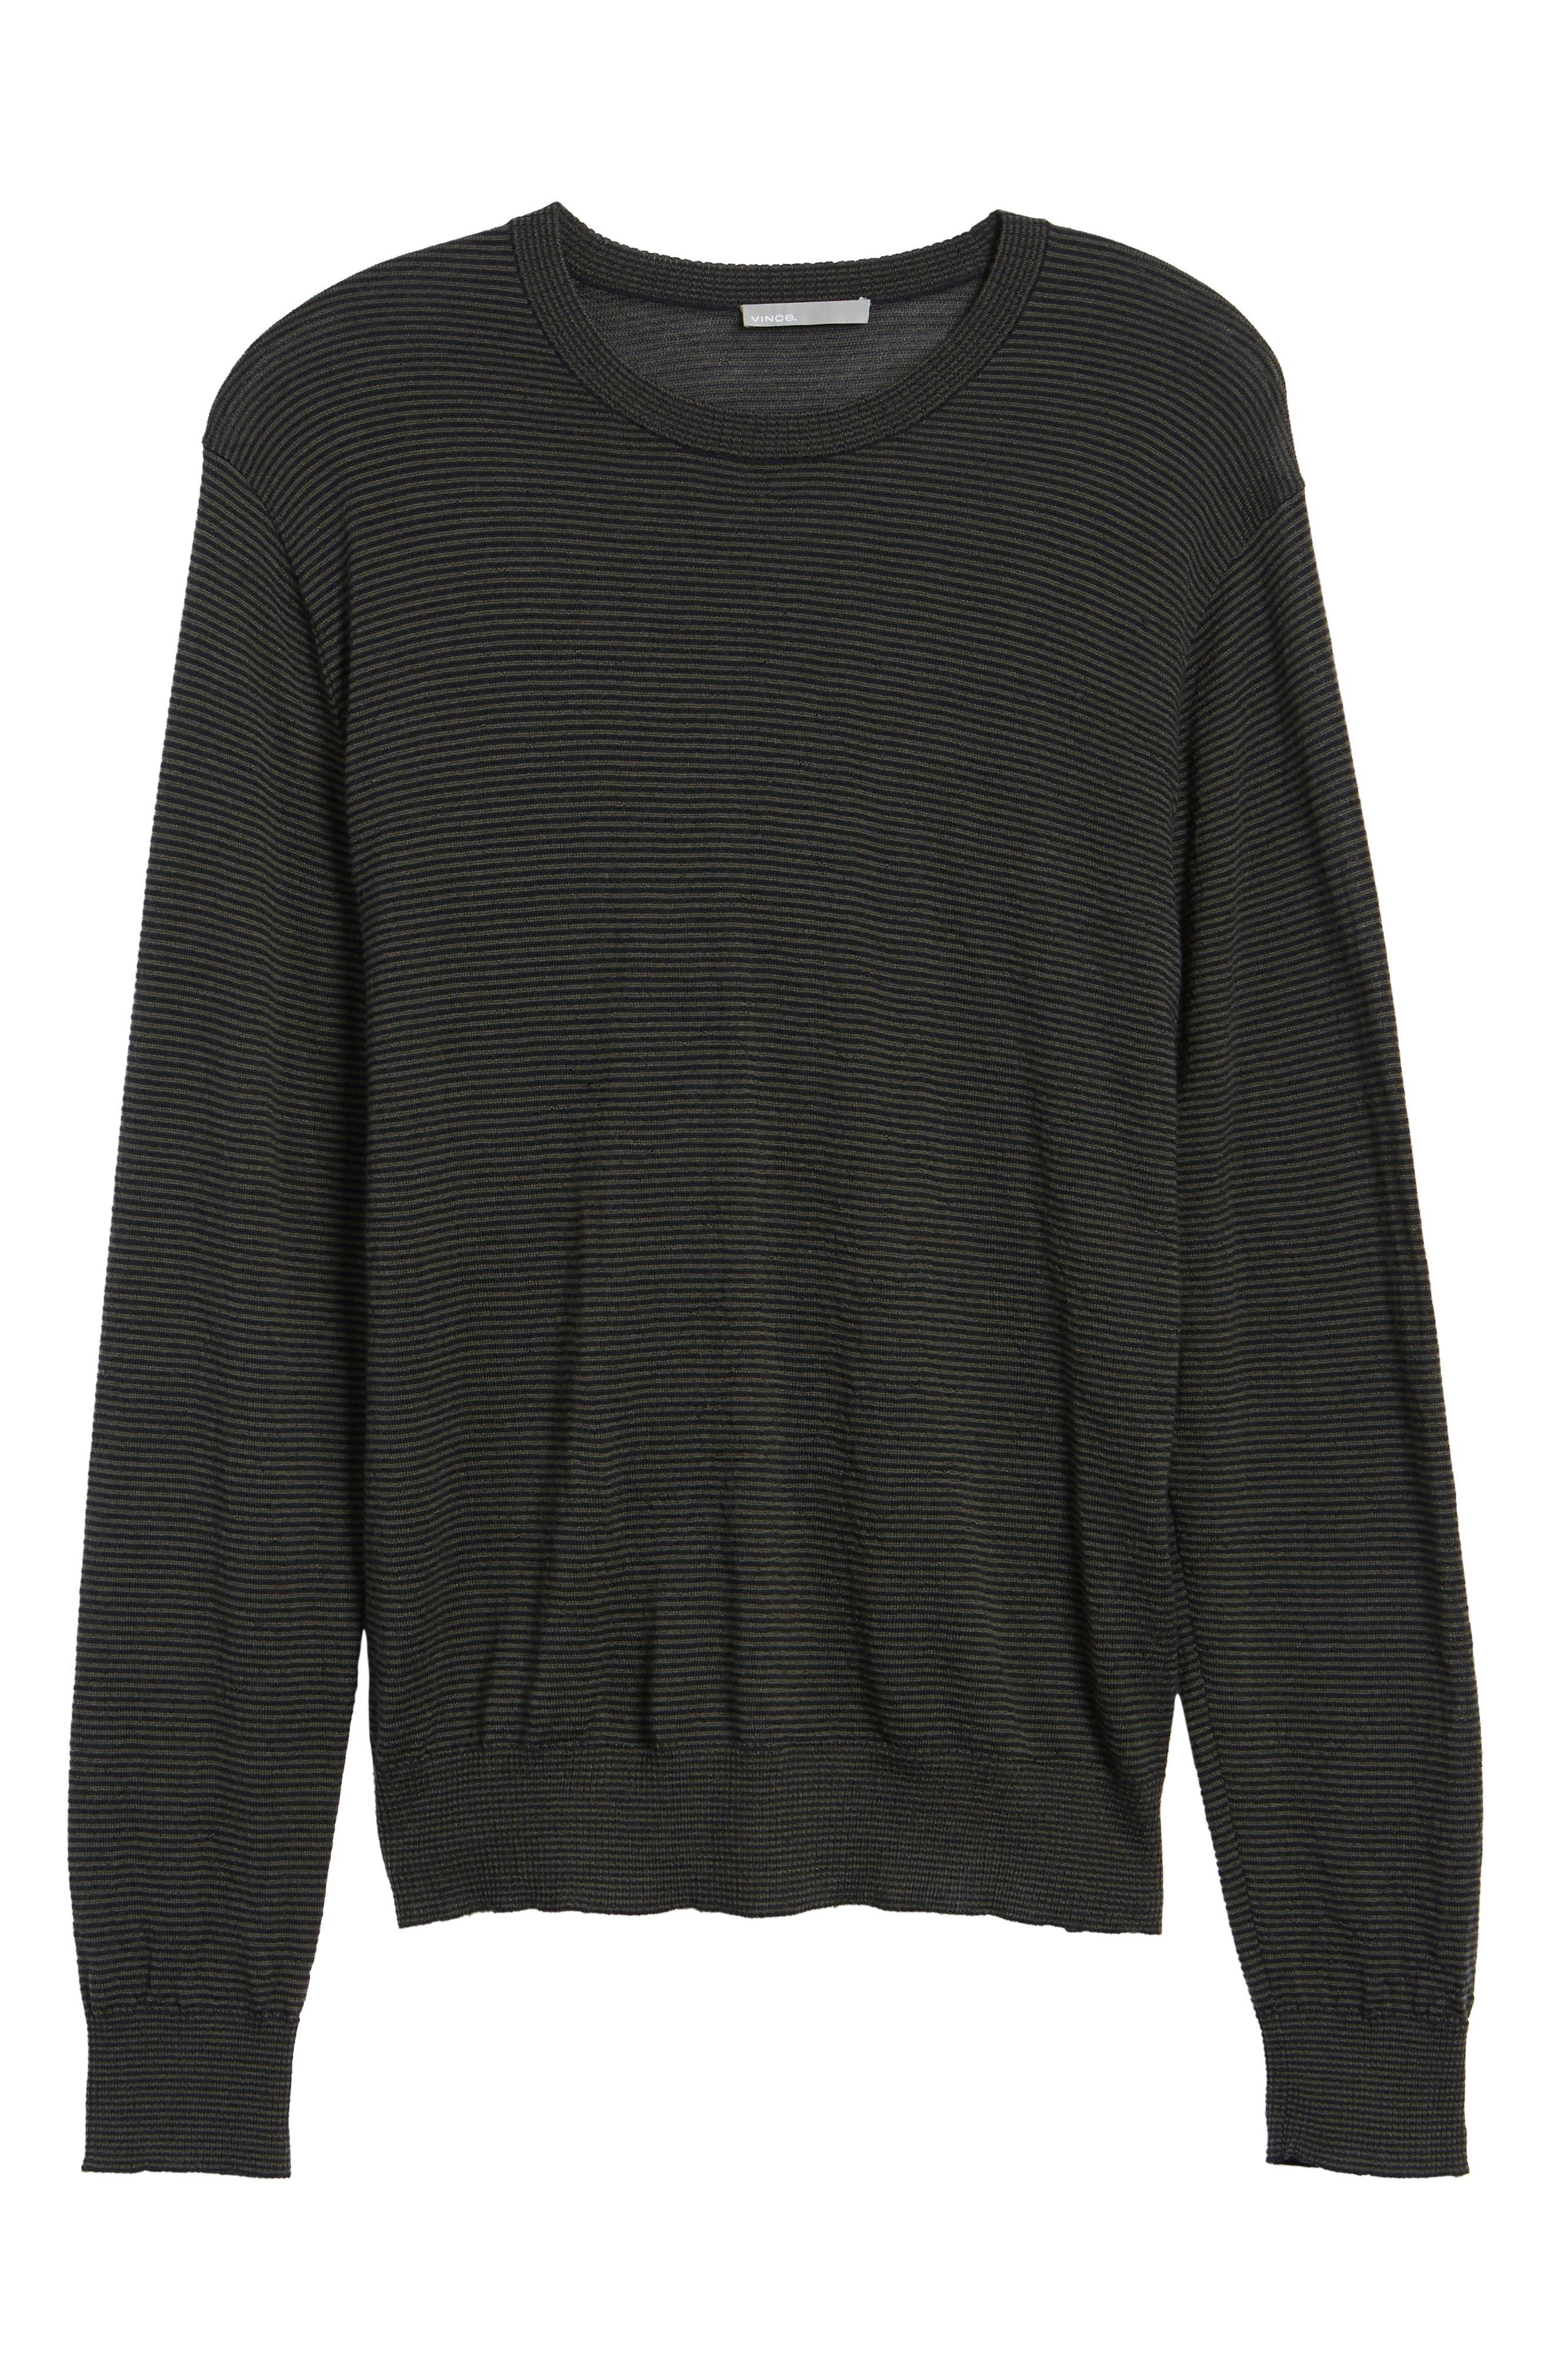 Regular Fit Pinstripe Wool Sweater,                             Alternate thumbnail 6, color,                             New Coastal/ H Charcoal